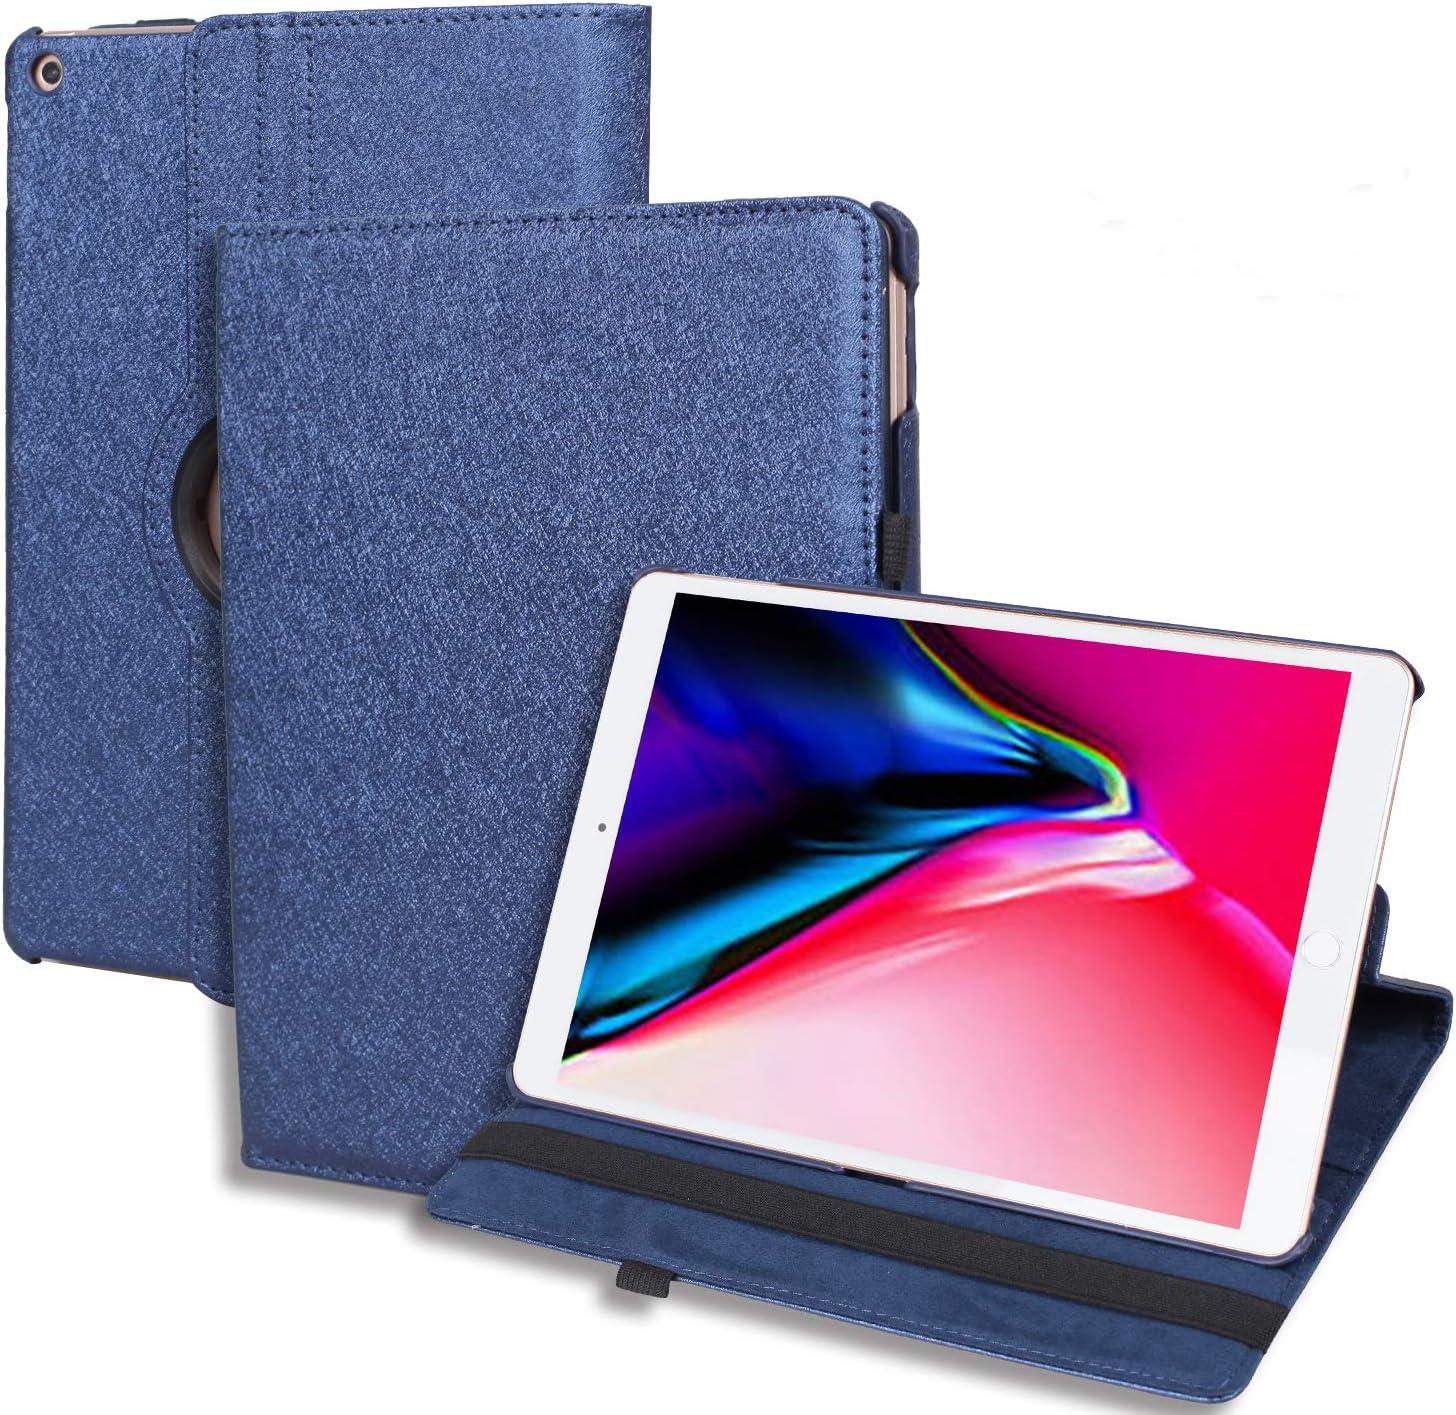 iPad 7th 8th Generation Case 10.2 Rota Max 55% OFF 2019-360 Degree sale